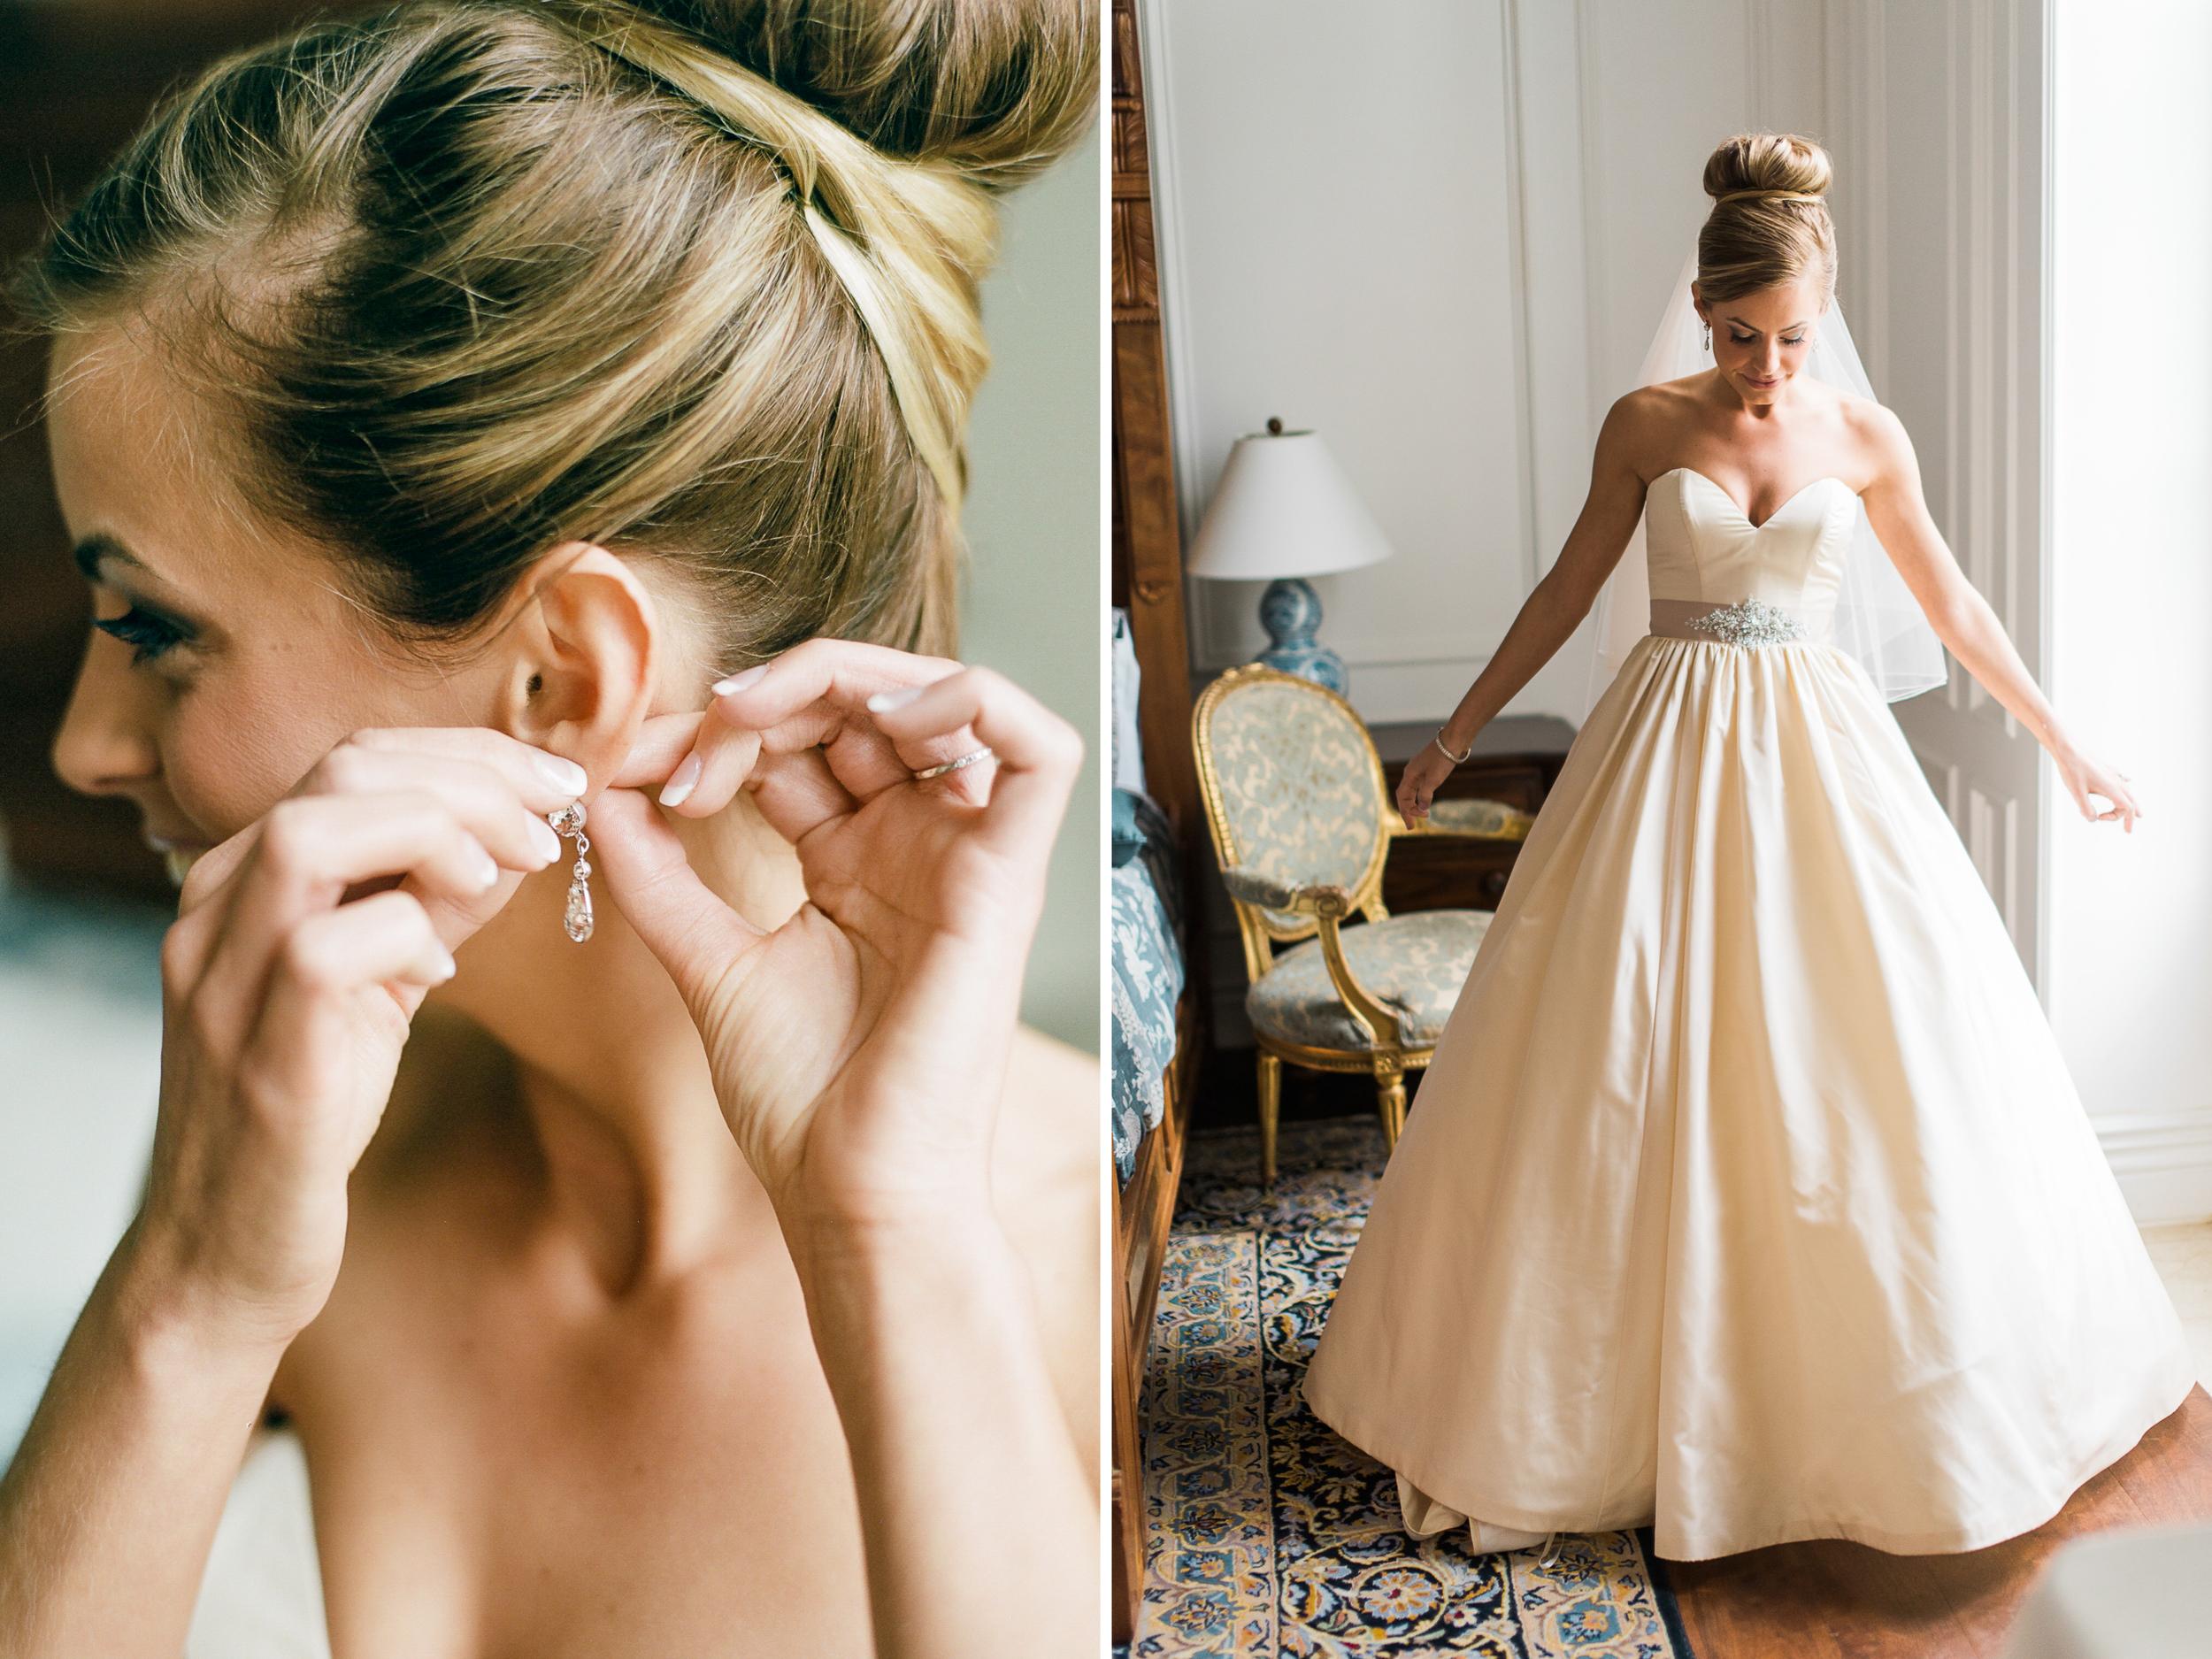 Dana-Fernandez-Photography-Houston-Wedding-Photographer-Style-Me-Pretty-Film-Texas-Destination-Photographer-108.jpg